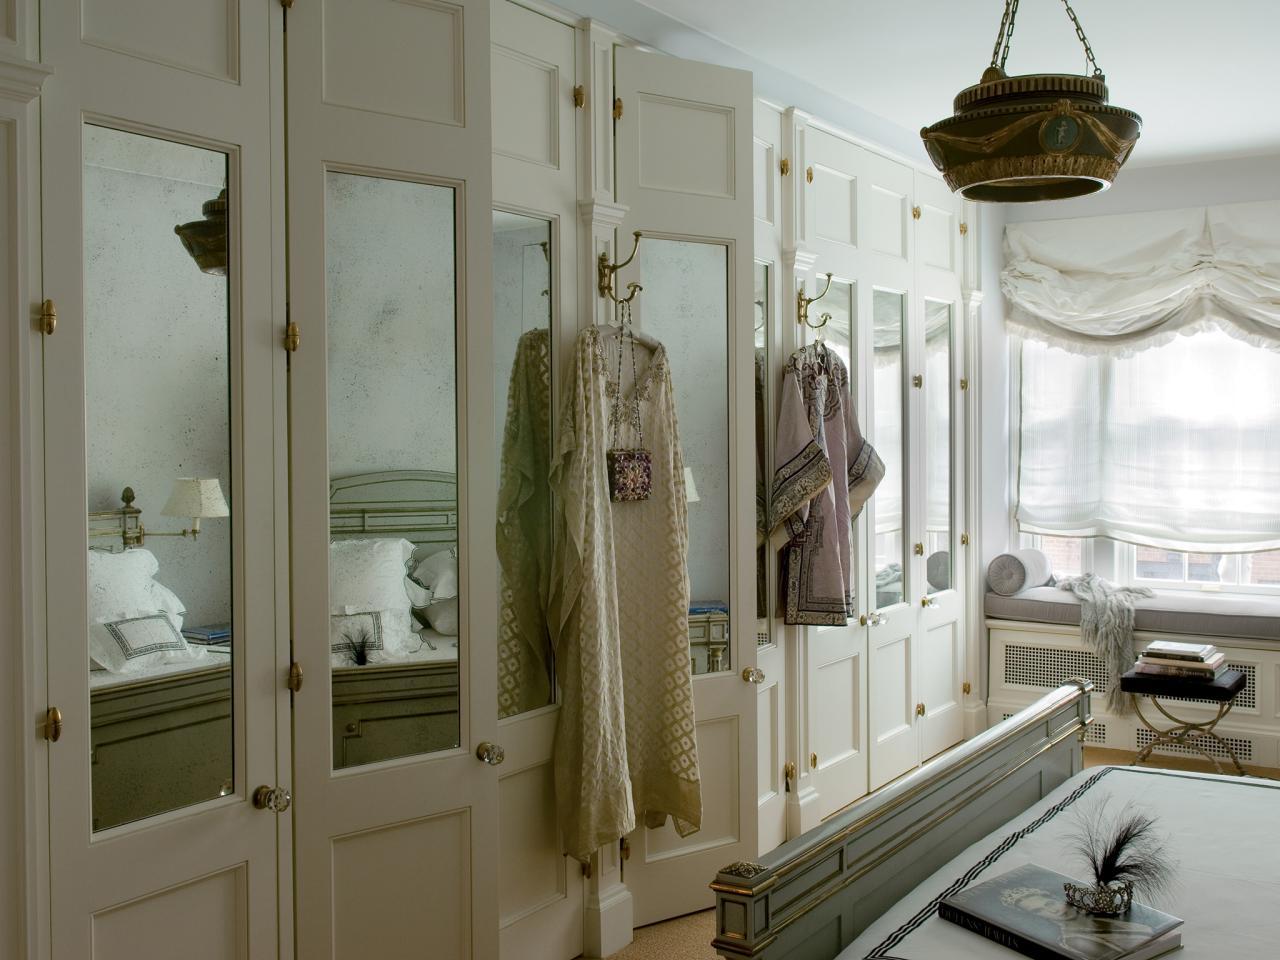 CI-Farrow-And-Ball-The-Art-of-Color-pg110_bedroom-mirrored-closet-doors_4x3_jpg_rend_hgtvcom_1280_960.jpg